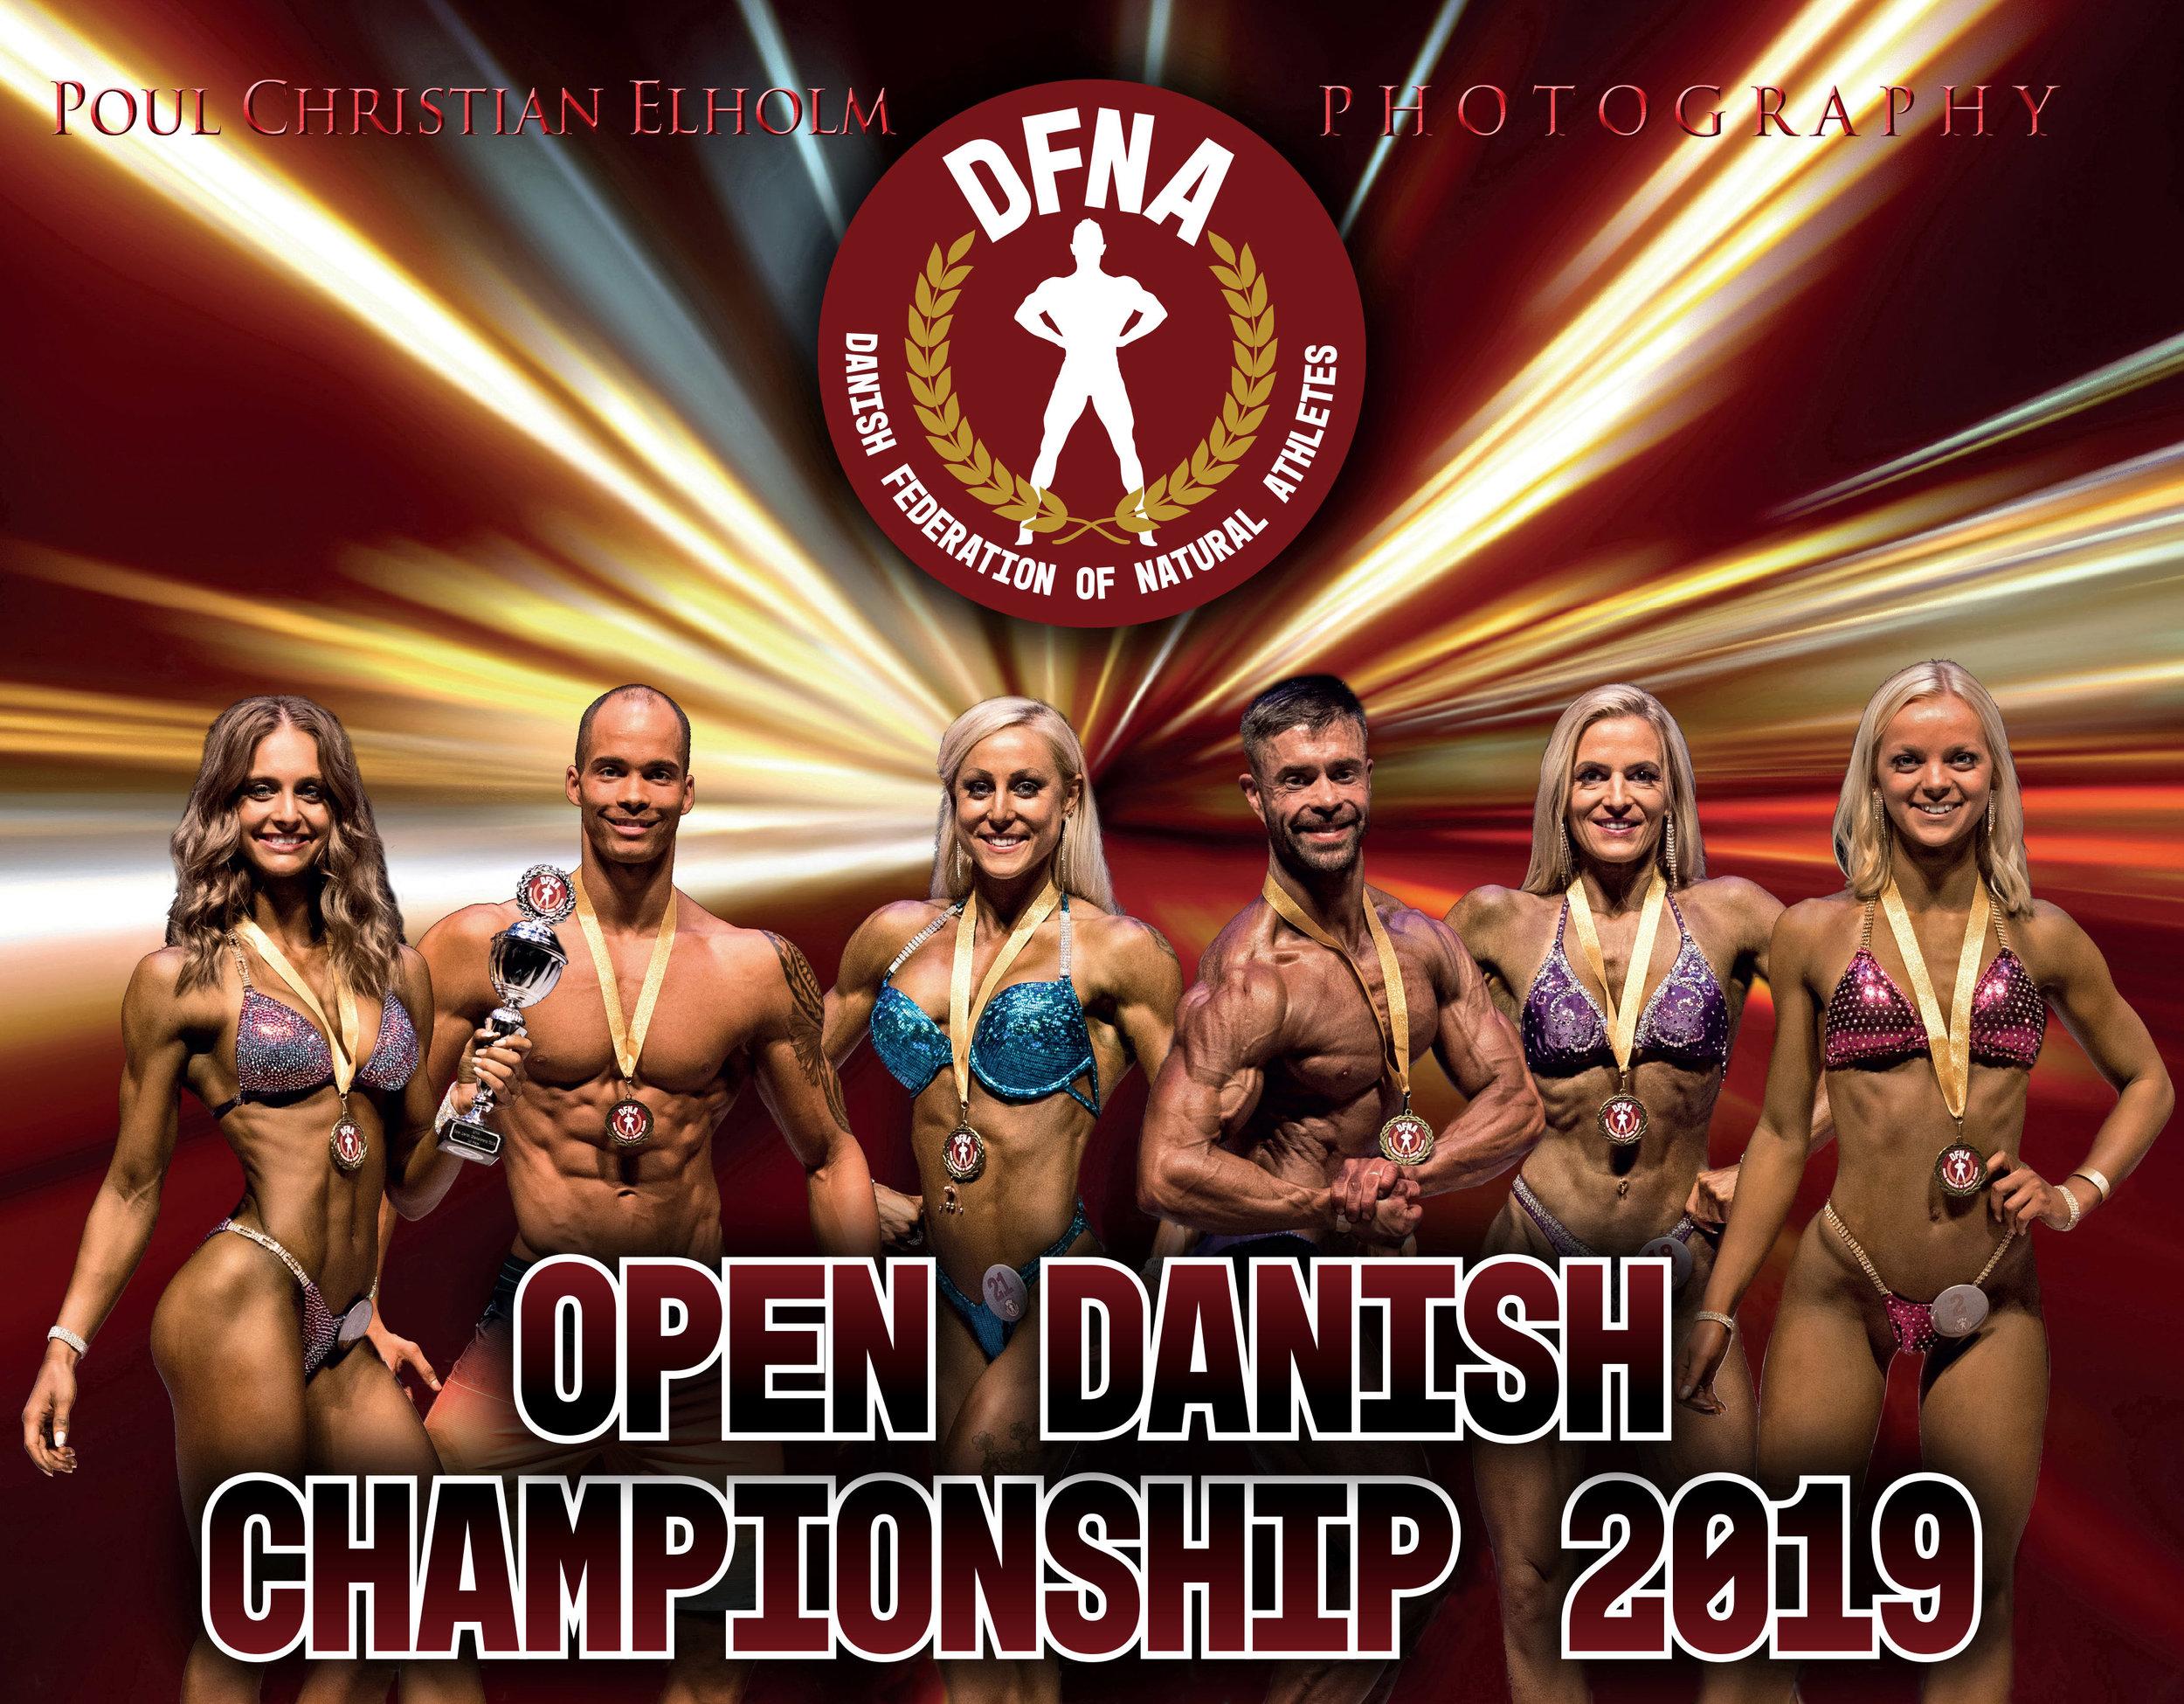 DFNA-Open-Danish-Championship-2019-PCE-1-1.jpg